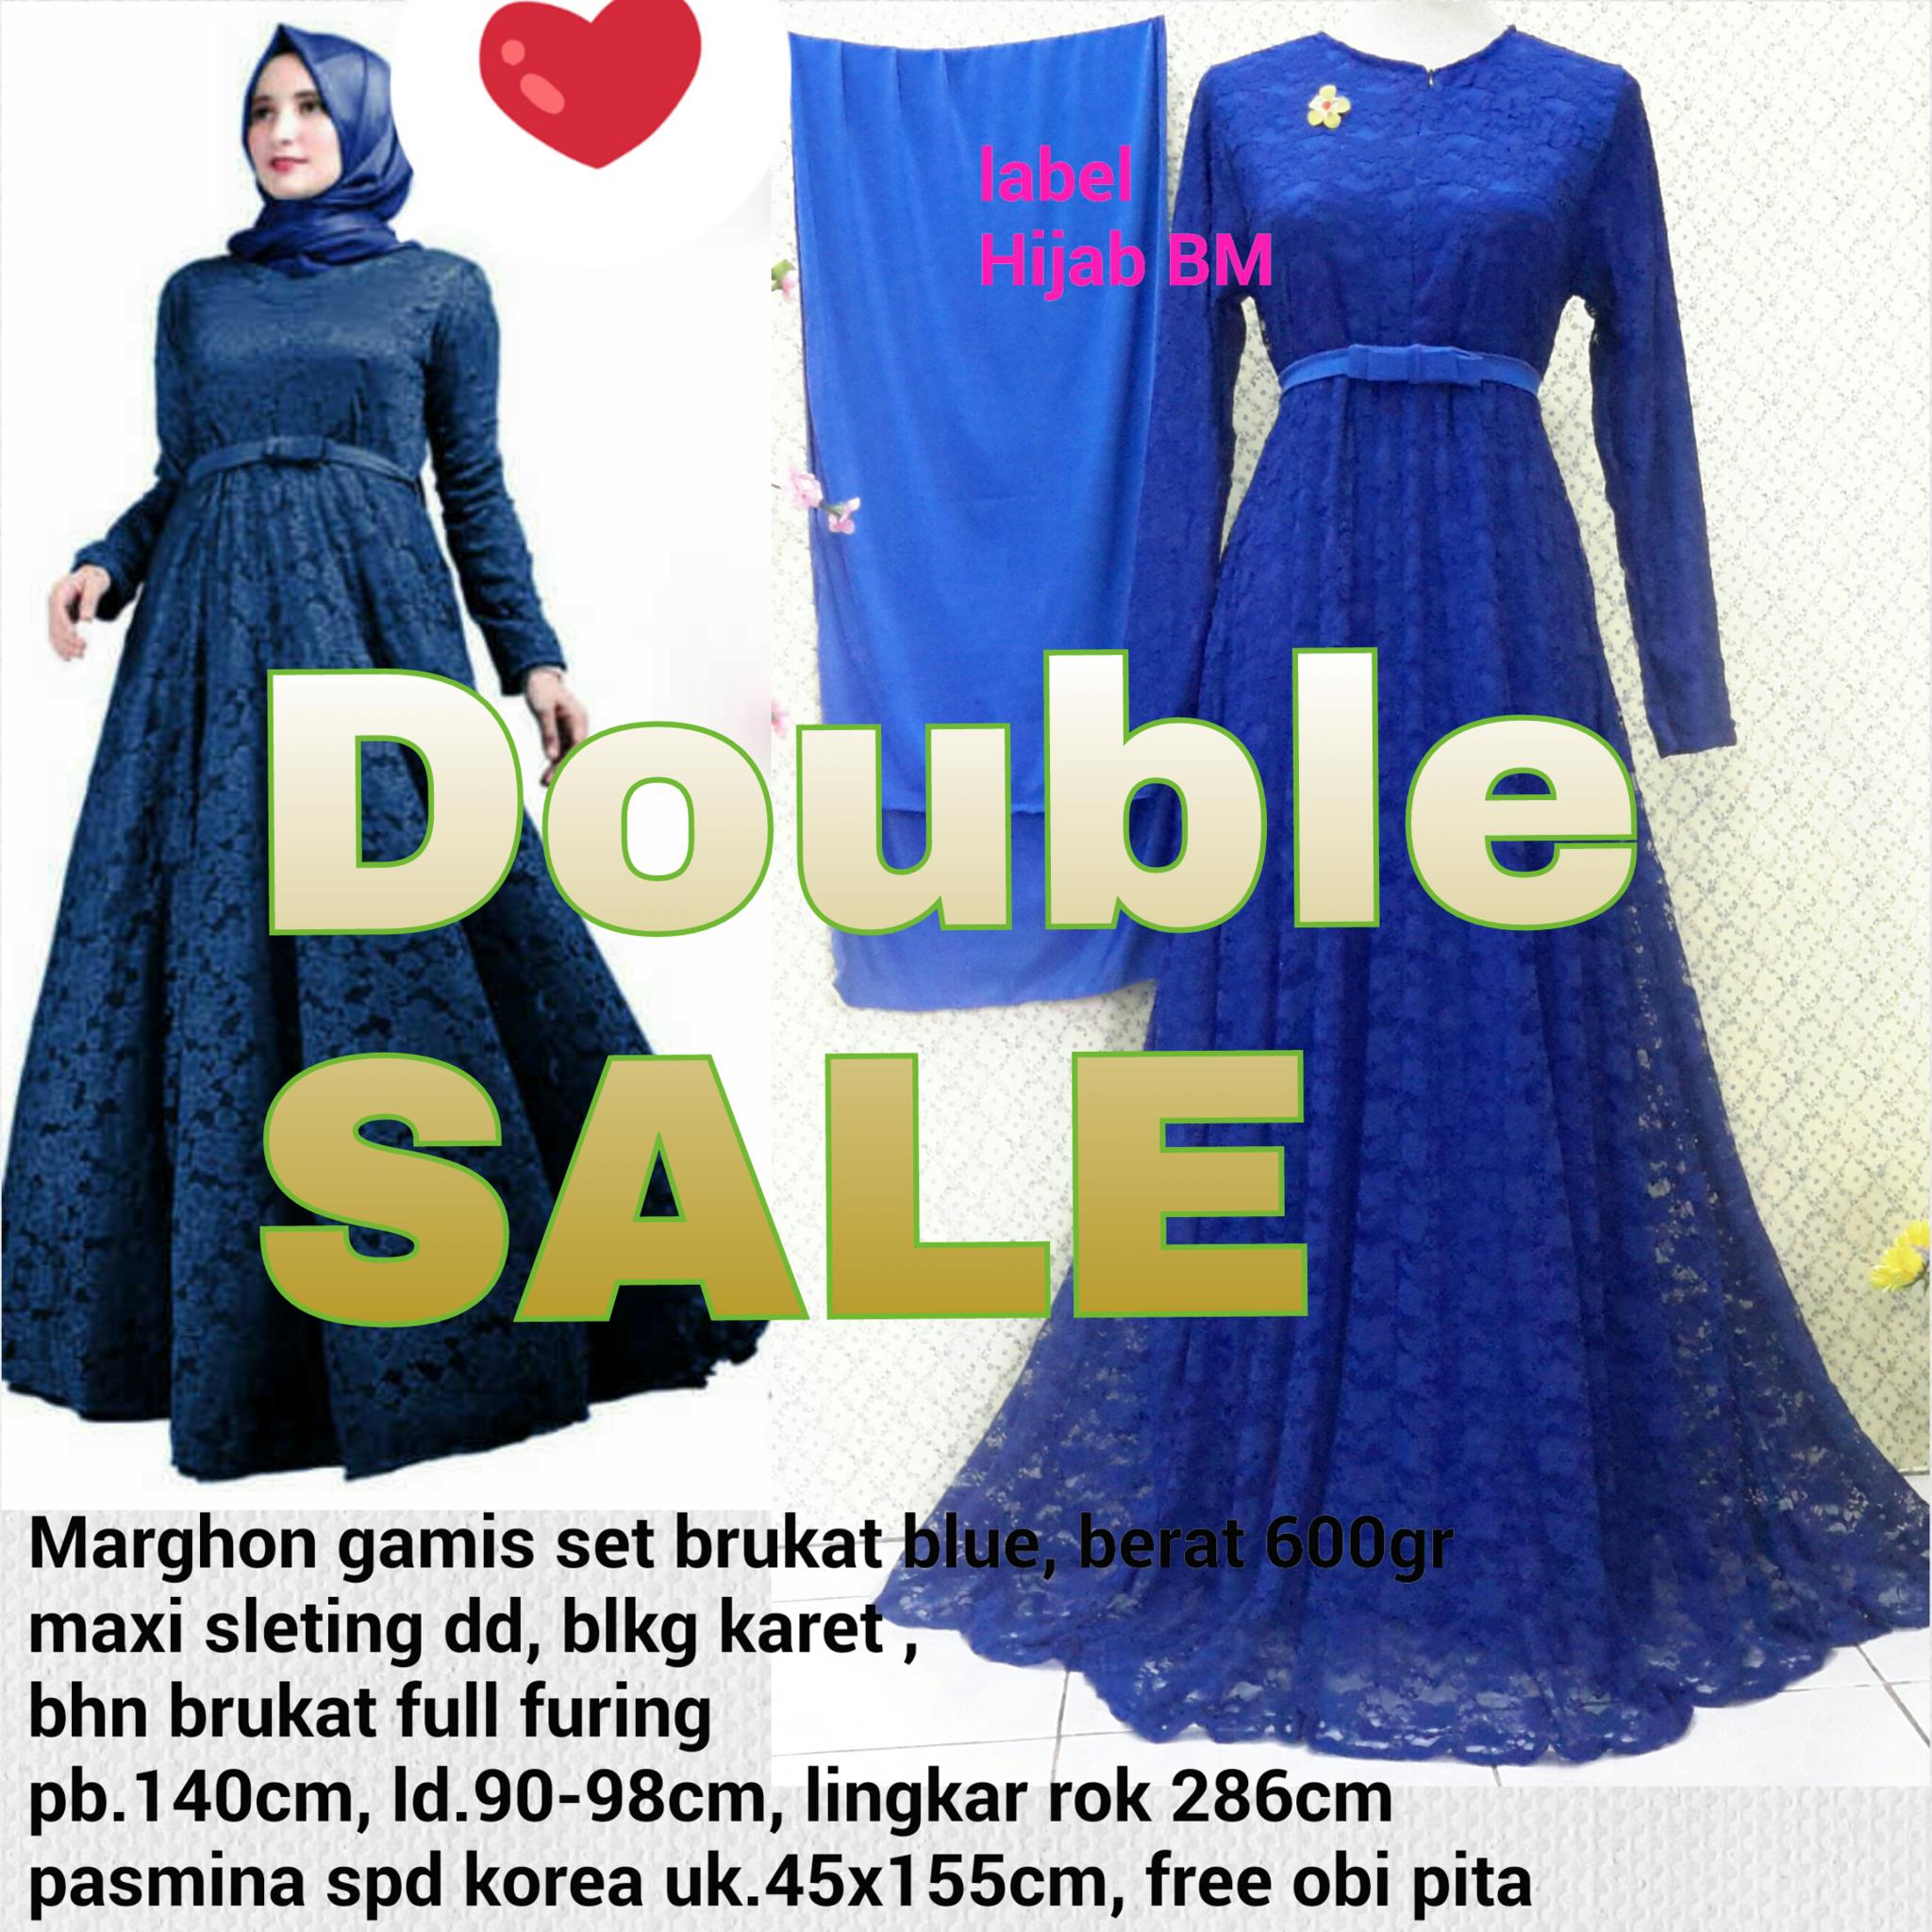 new marghon gamis set brukat busui lapis furing rok lebar, hijab bm,